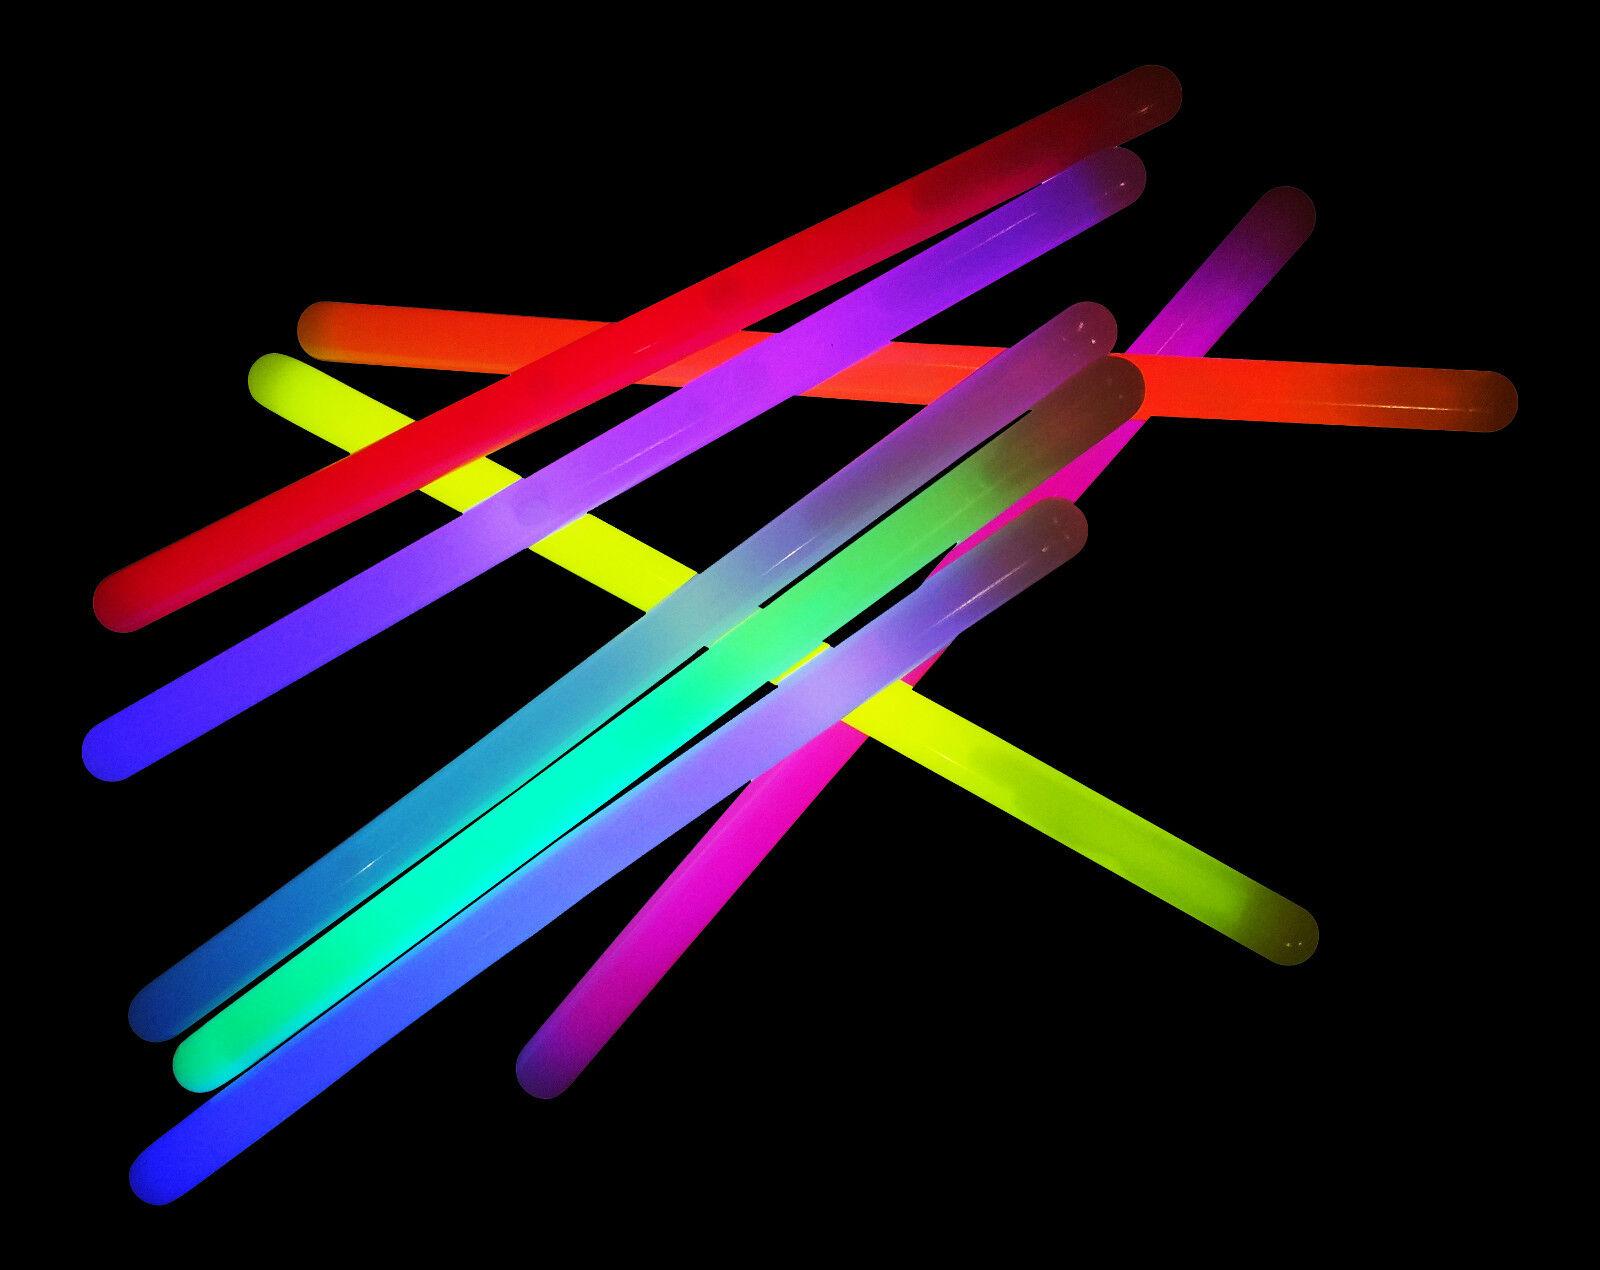 200x 12  Mega Glowsticks - Mixed Glow Batons Sticks (15mm) Glowtopia Festivals